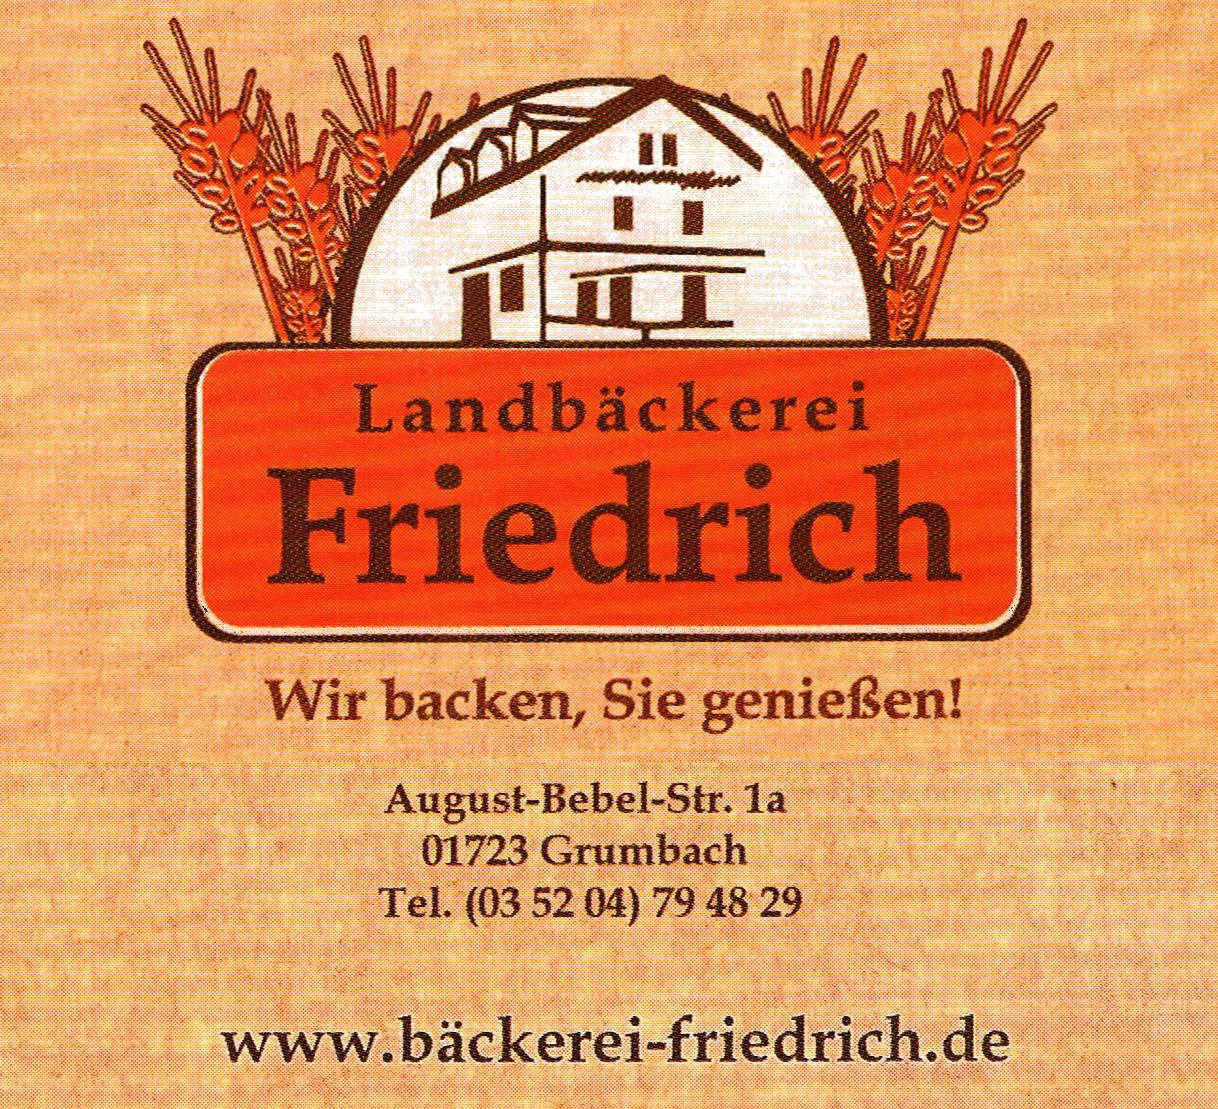 40-LandBäckereiFriedrich